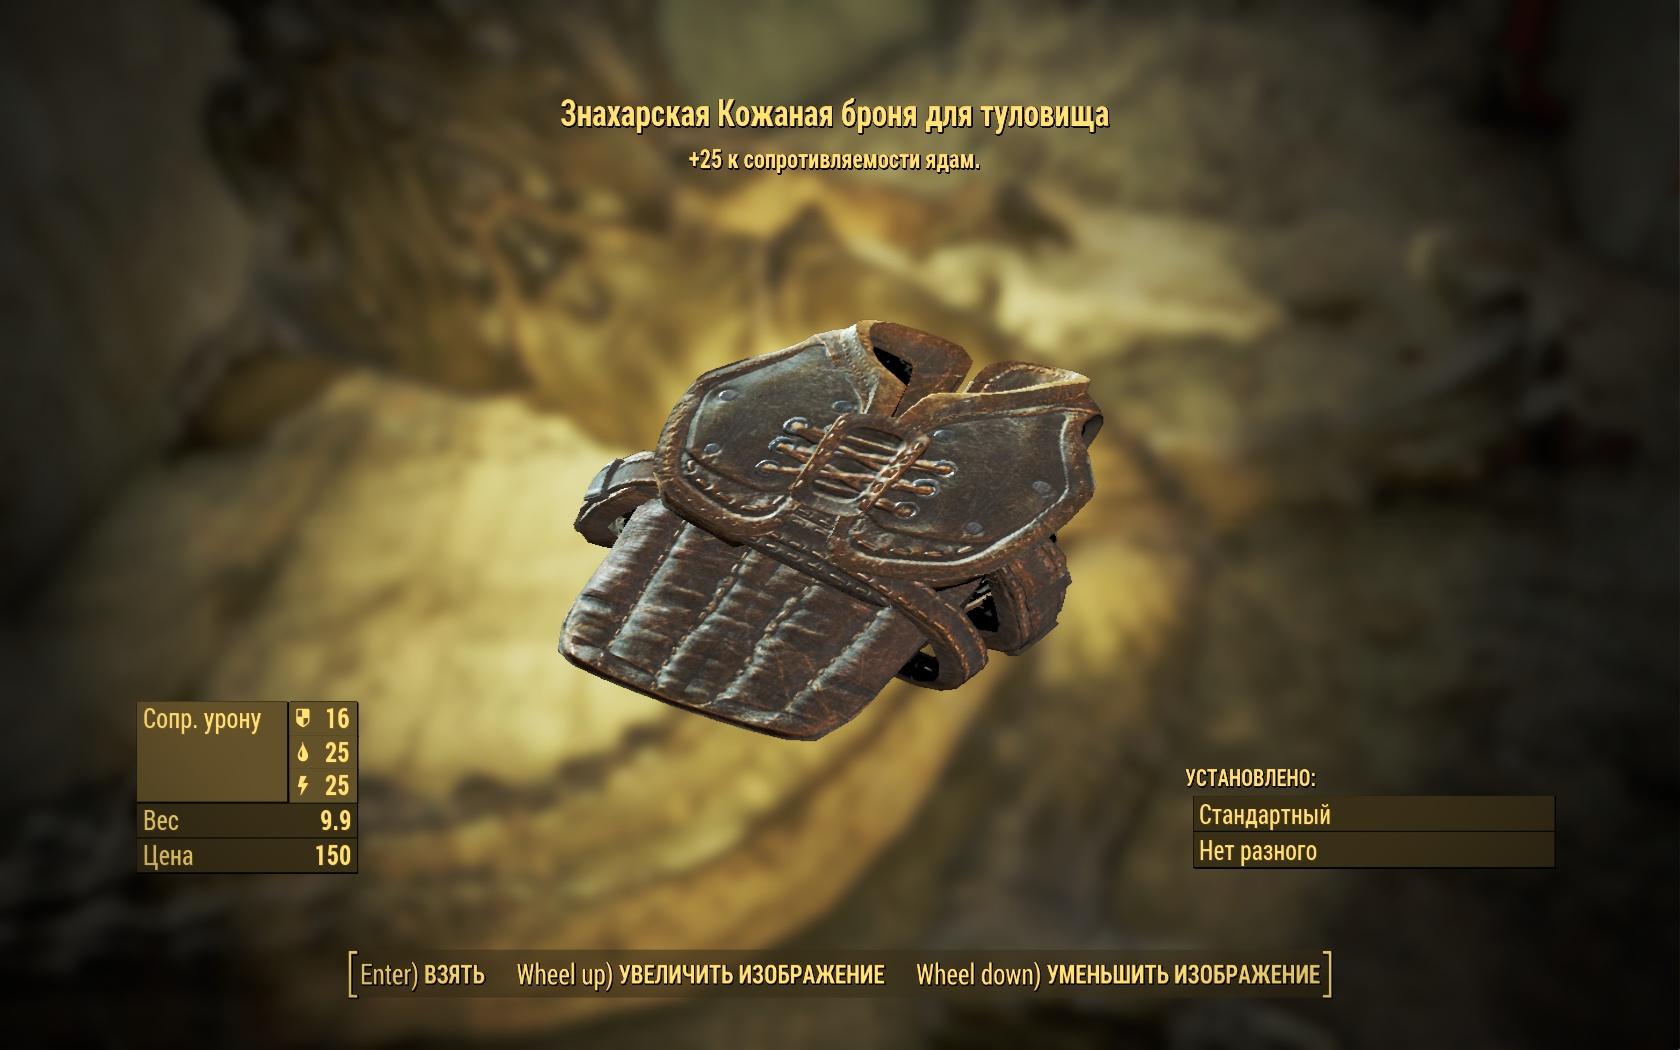 Знахарская кожаная броня для туловища - Fallout 4 броня, Знахарская, кожаная, Одежда